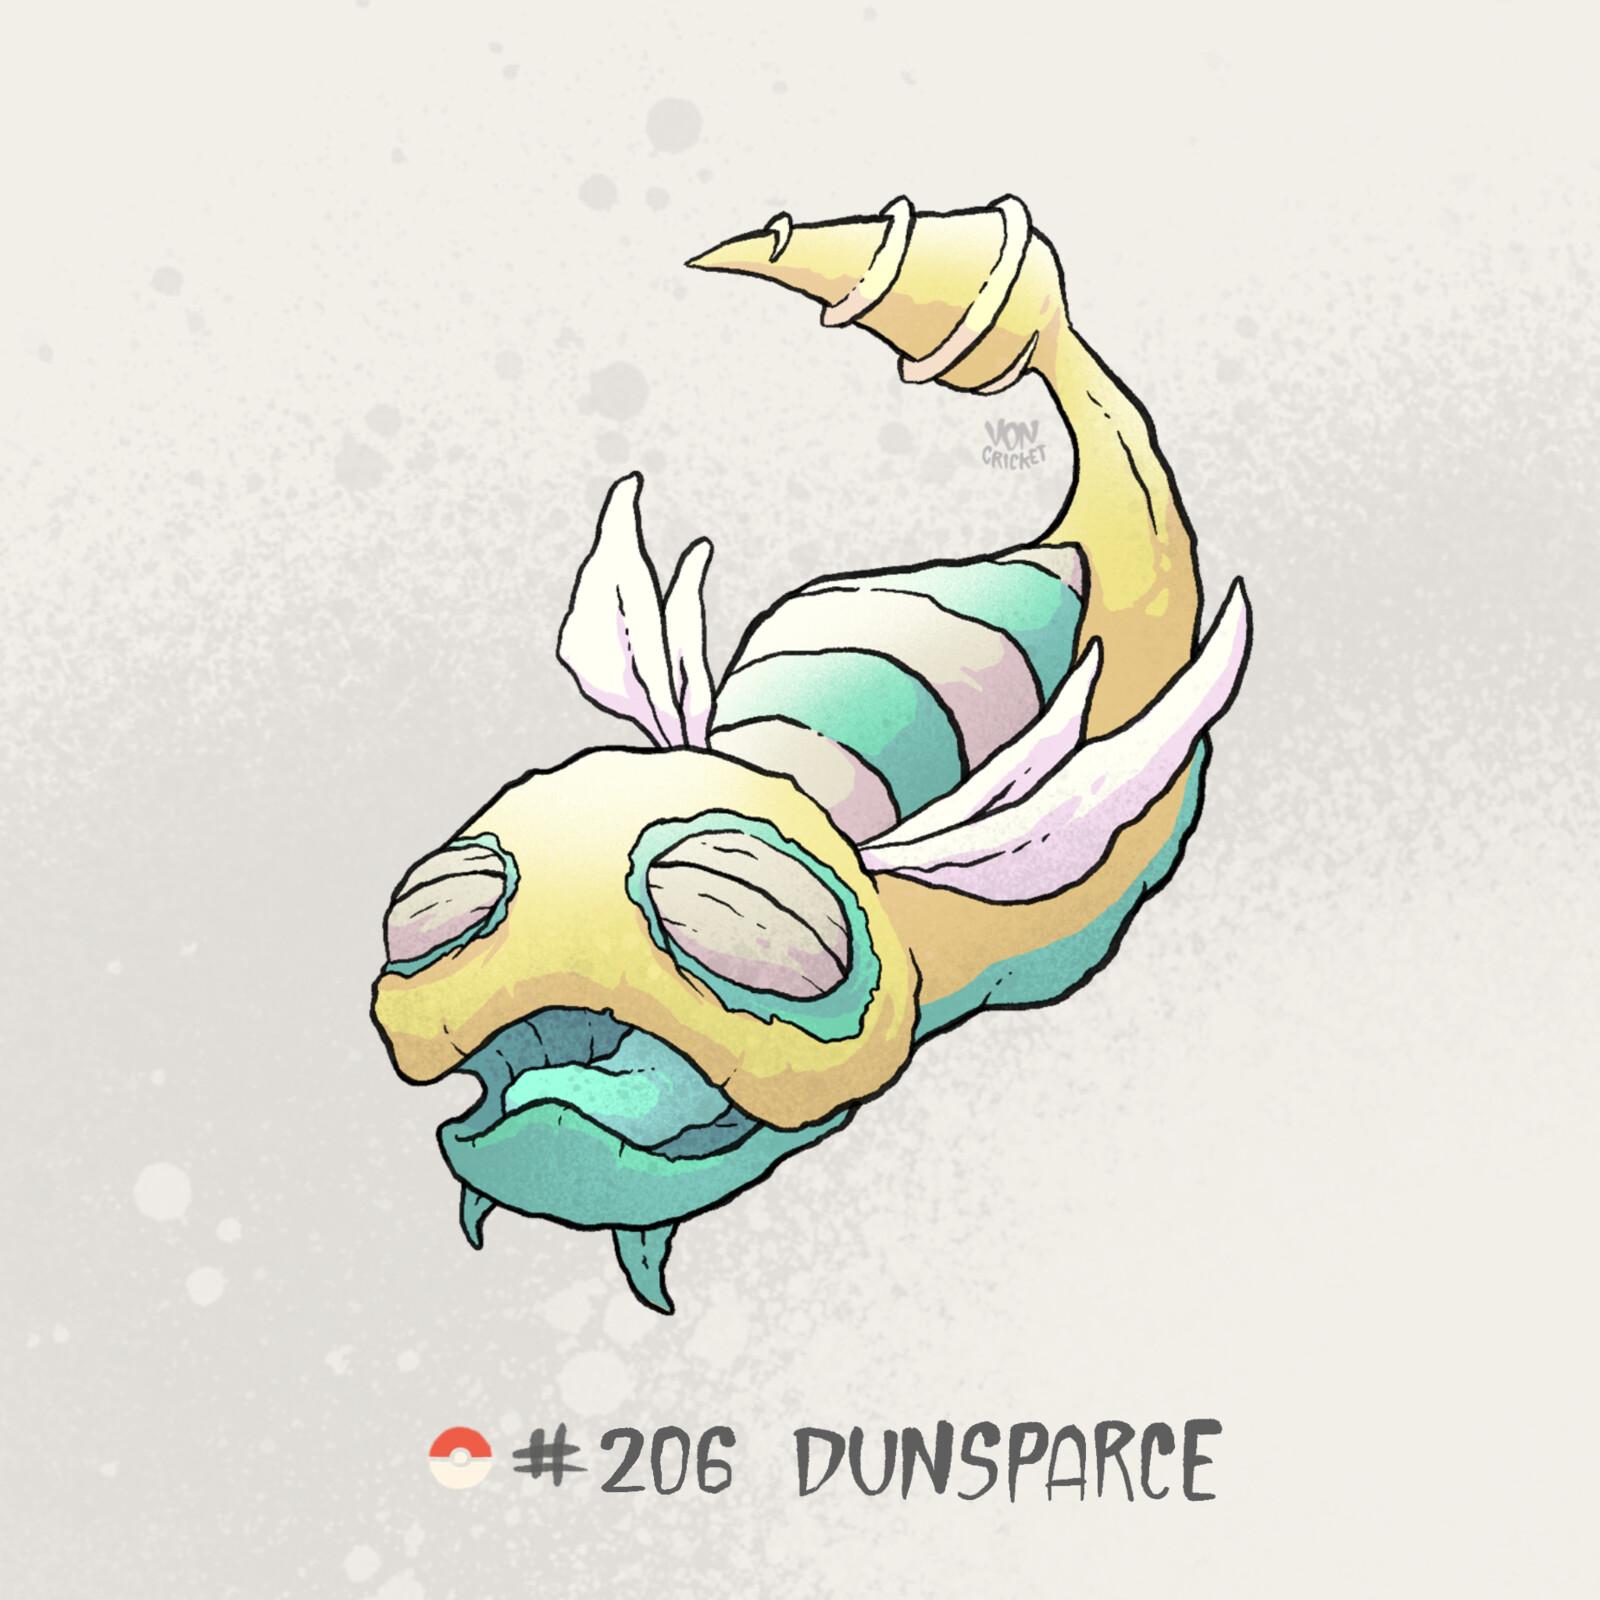 #206 Dunsparce